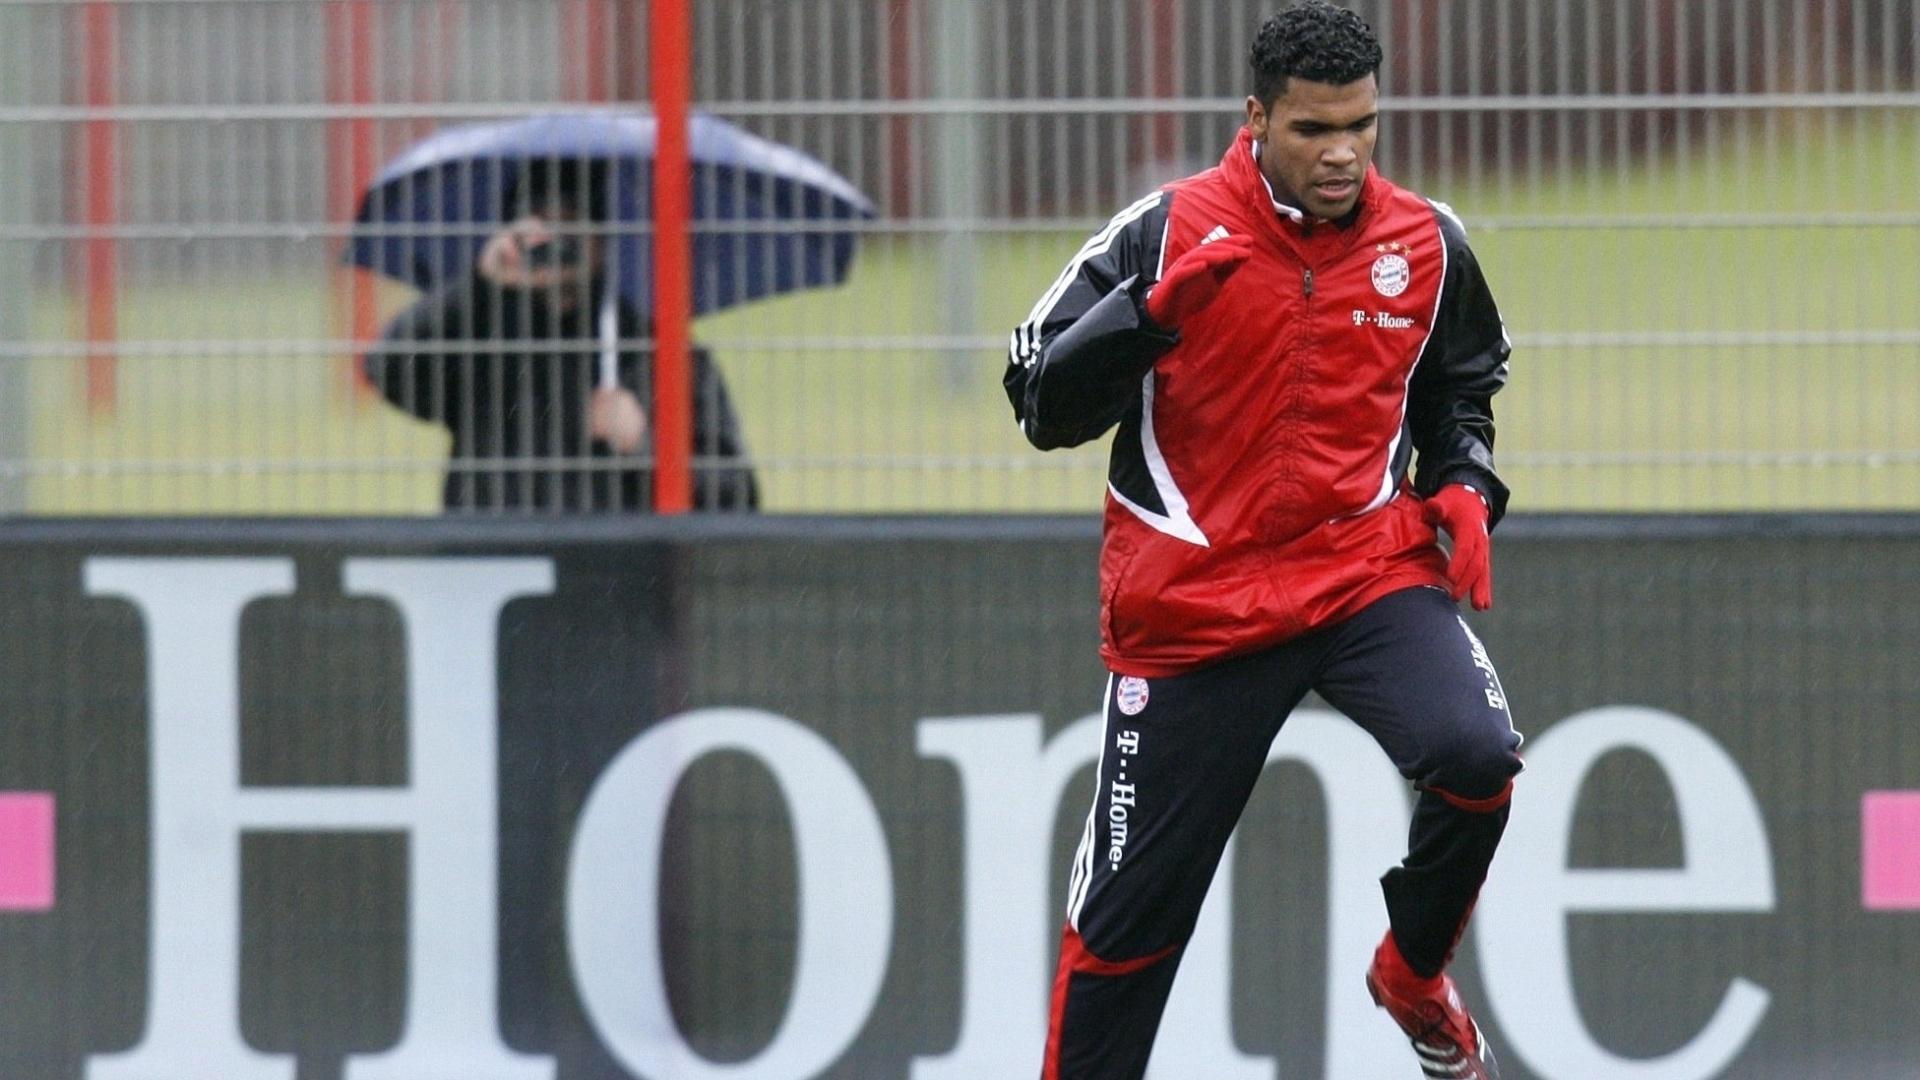 O zagueiro Breno treina no Bayern de Munique (07/01/2008)